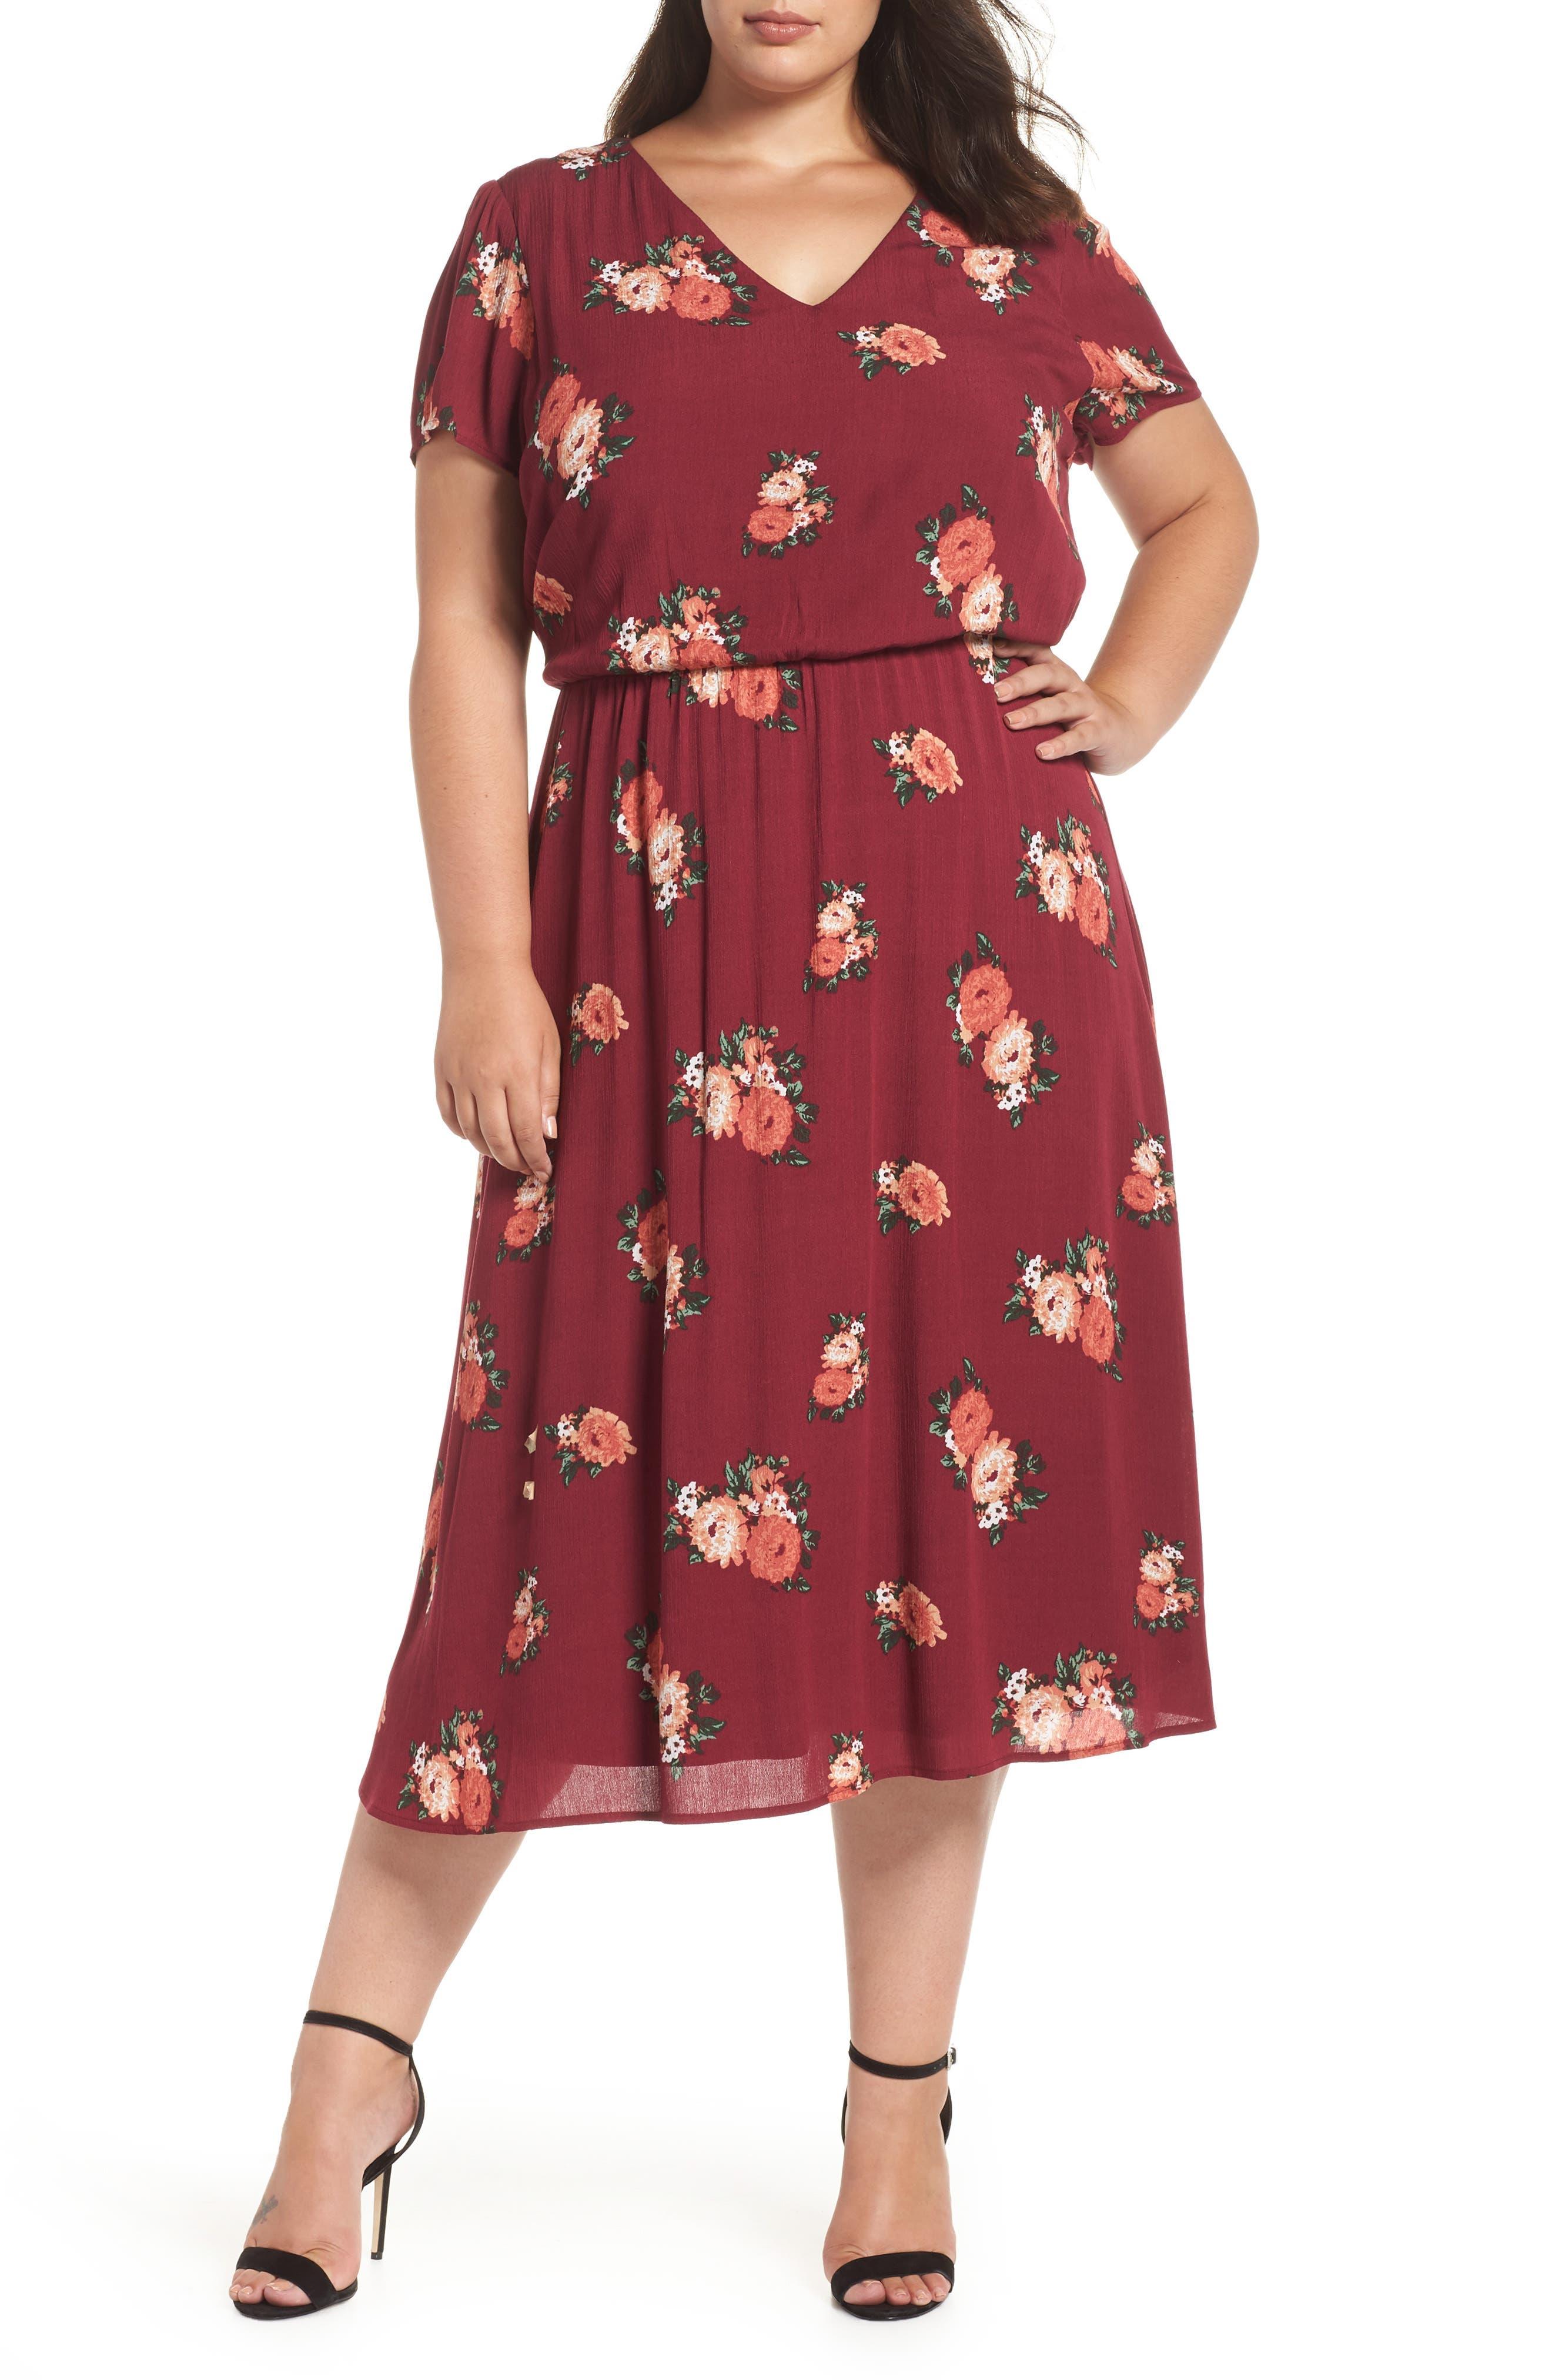 Blouson Midi Dress,                             Main thumbnail 1, color,                             RED RUMBA FLORAL